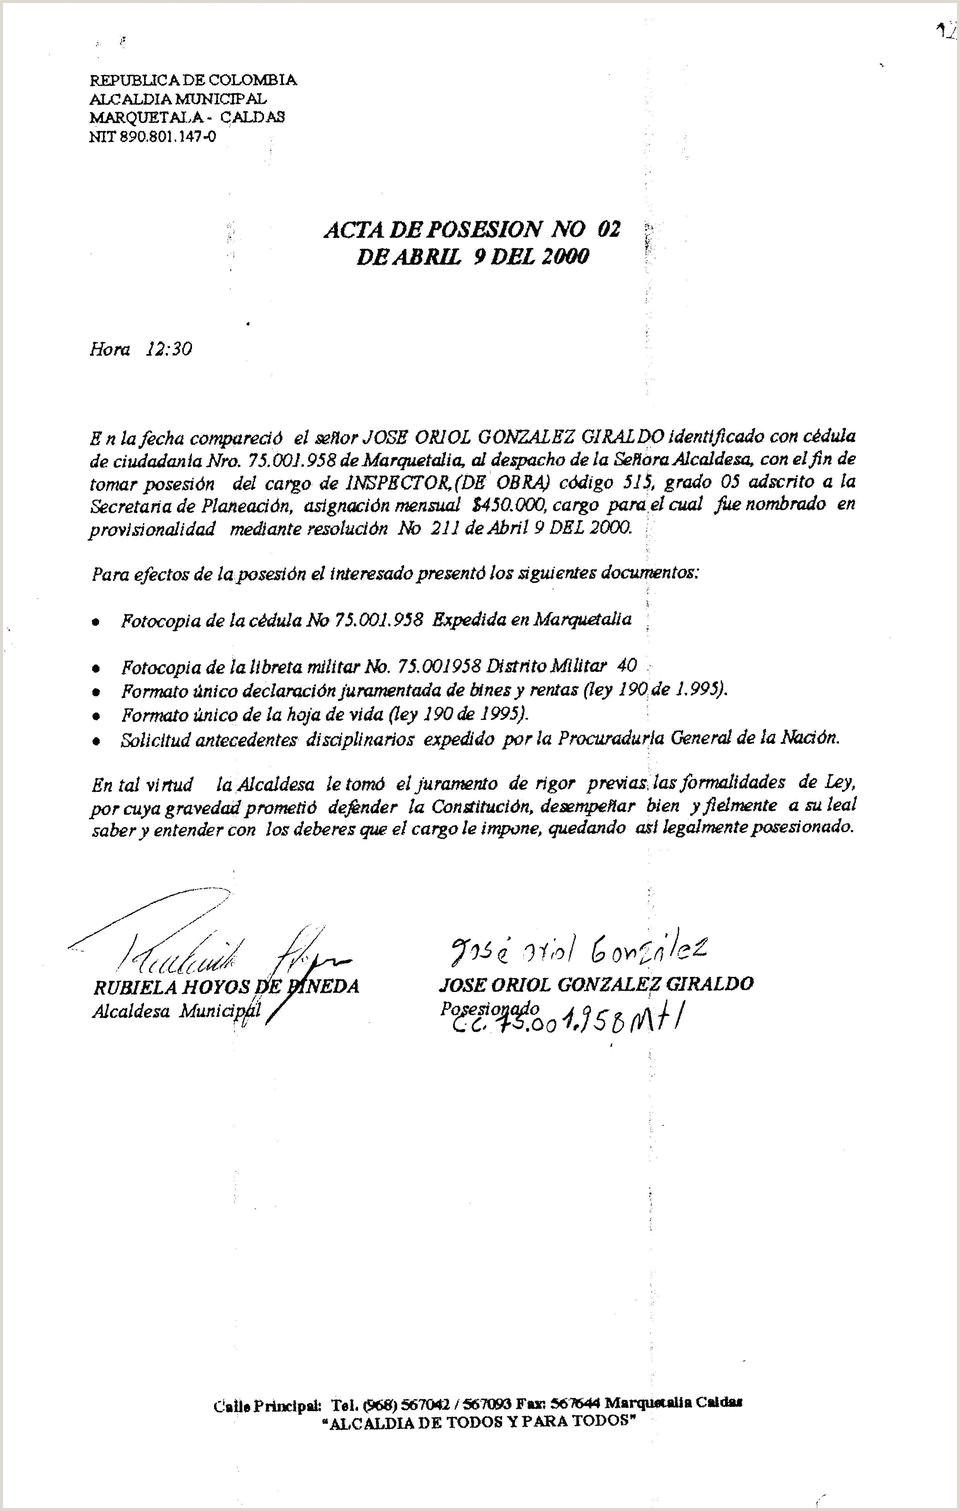 "Formato De Hoja De Vida Ley 190 D L Informaci""n General Periodo Valuado Dosdo Da Jj[ Jmes"